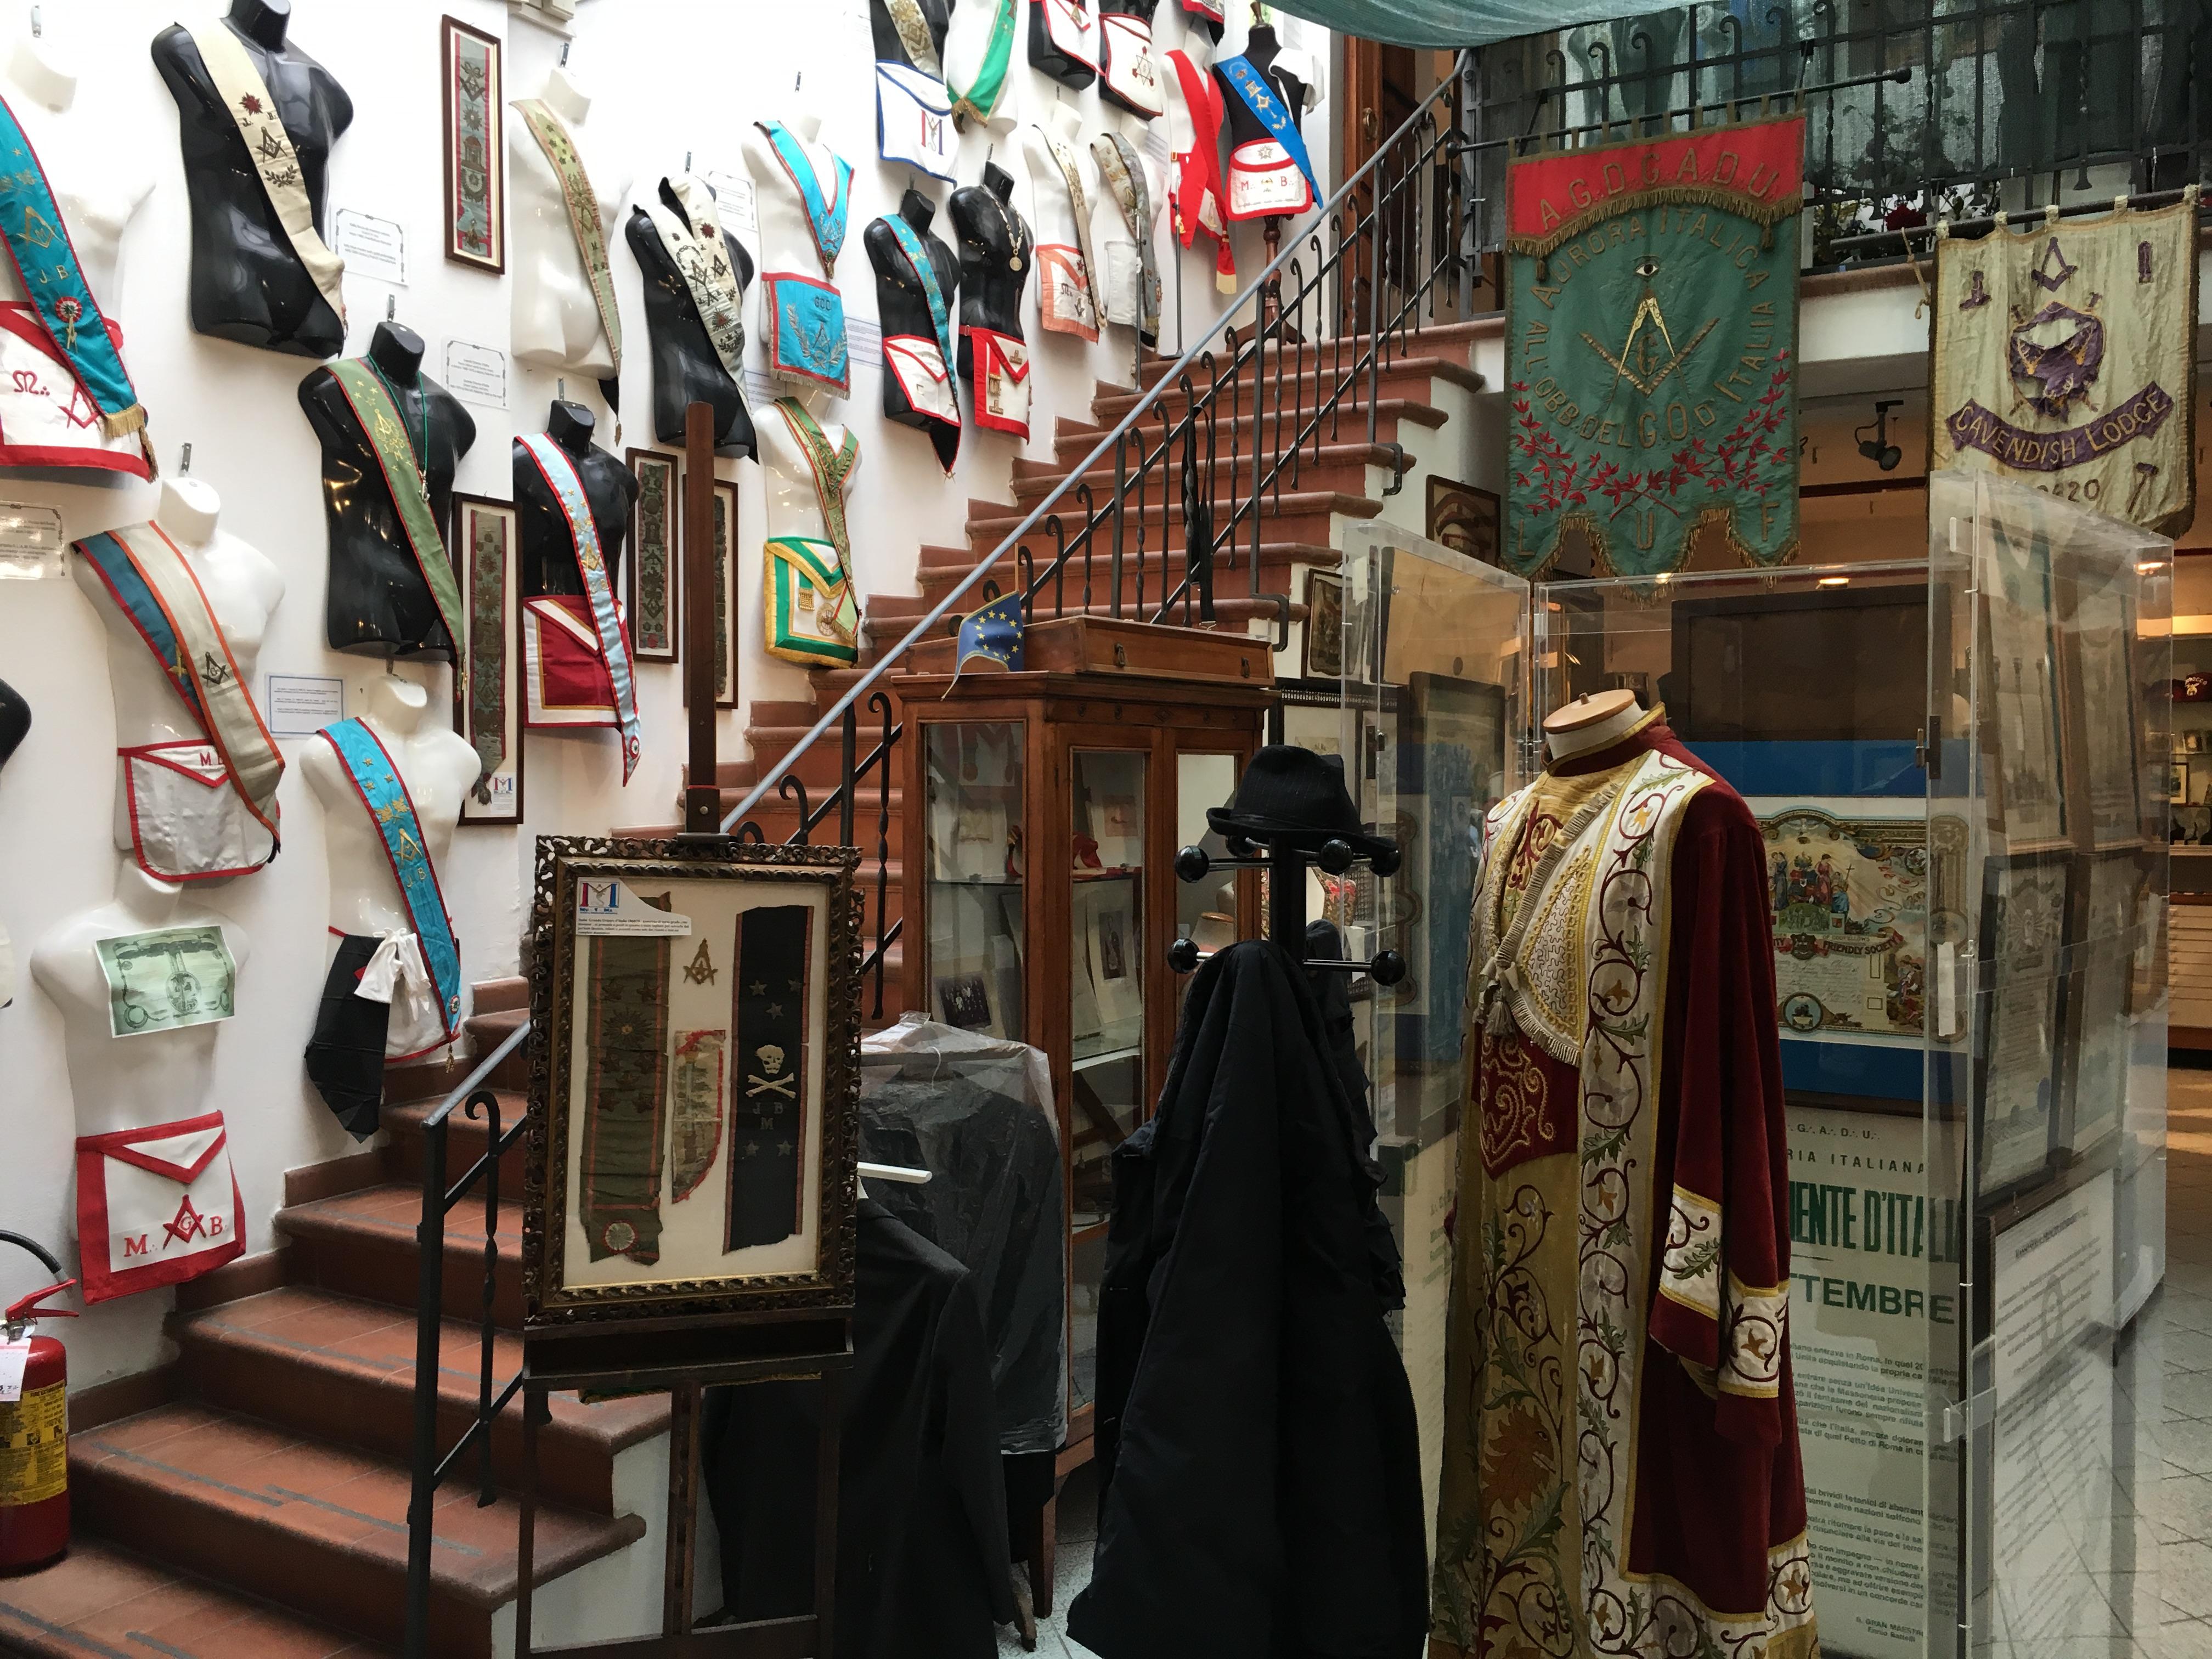 Museo di Simbologia Massonica-Musma